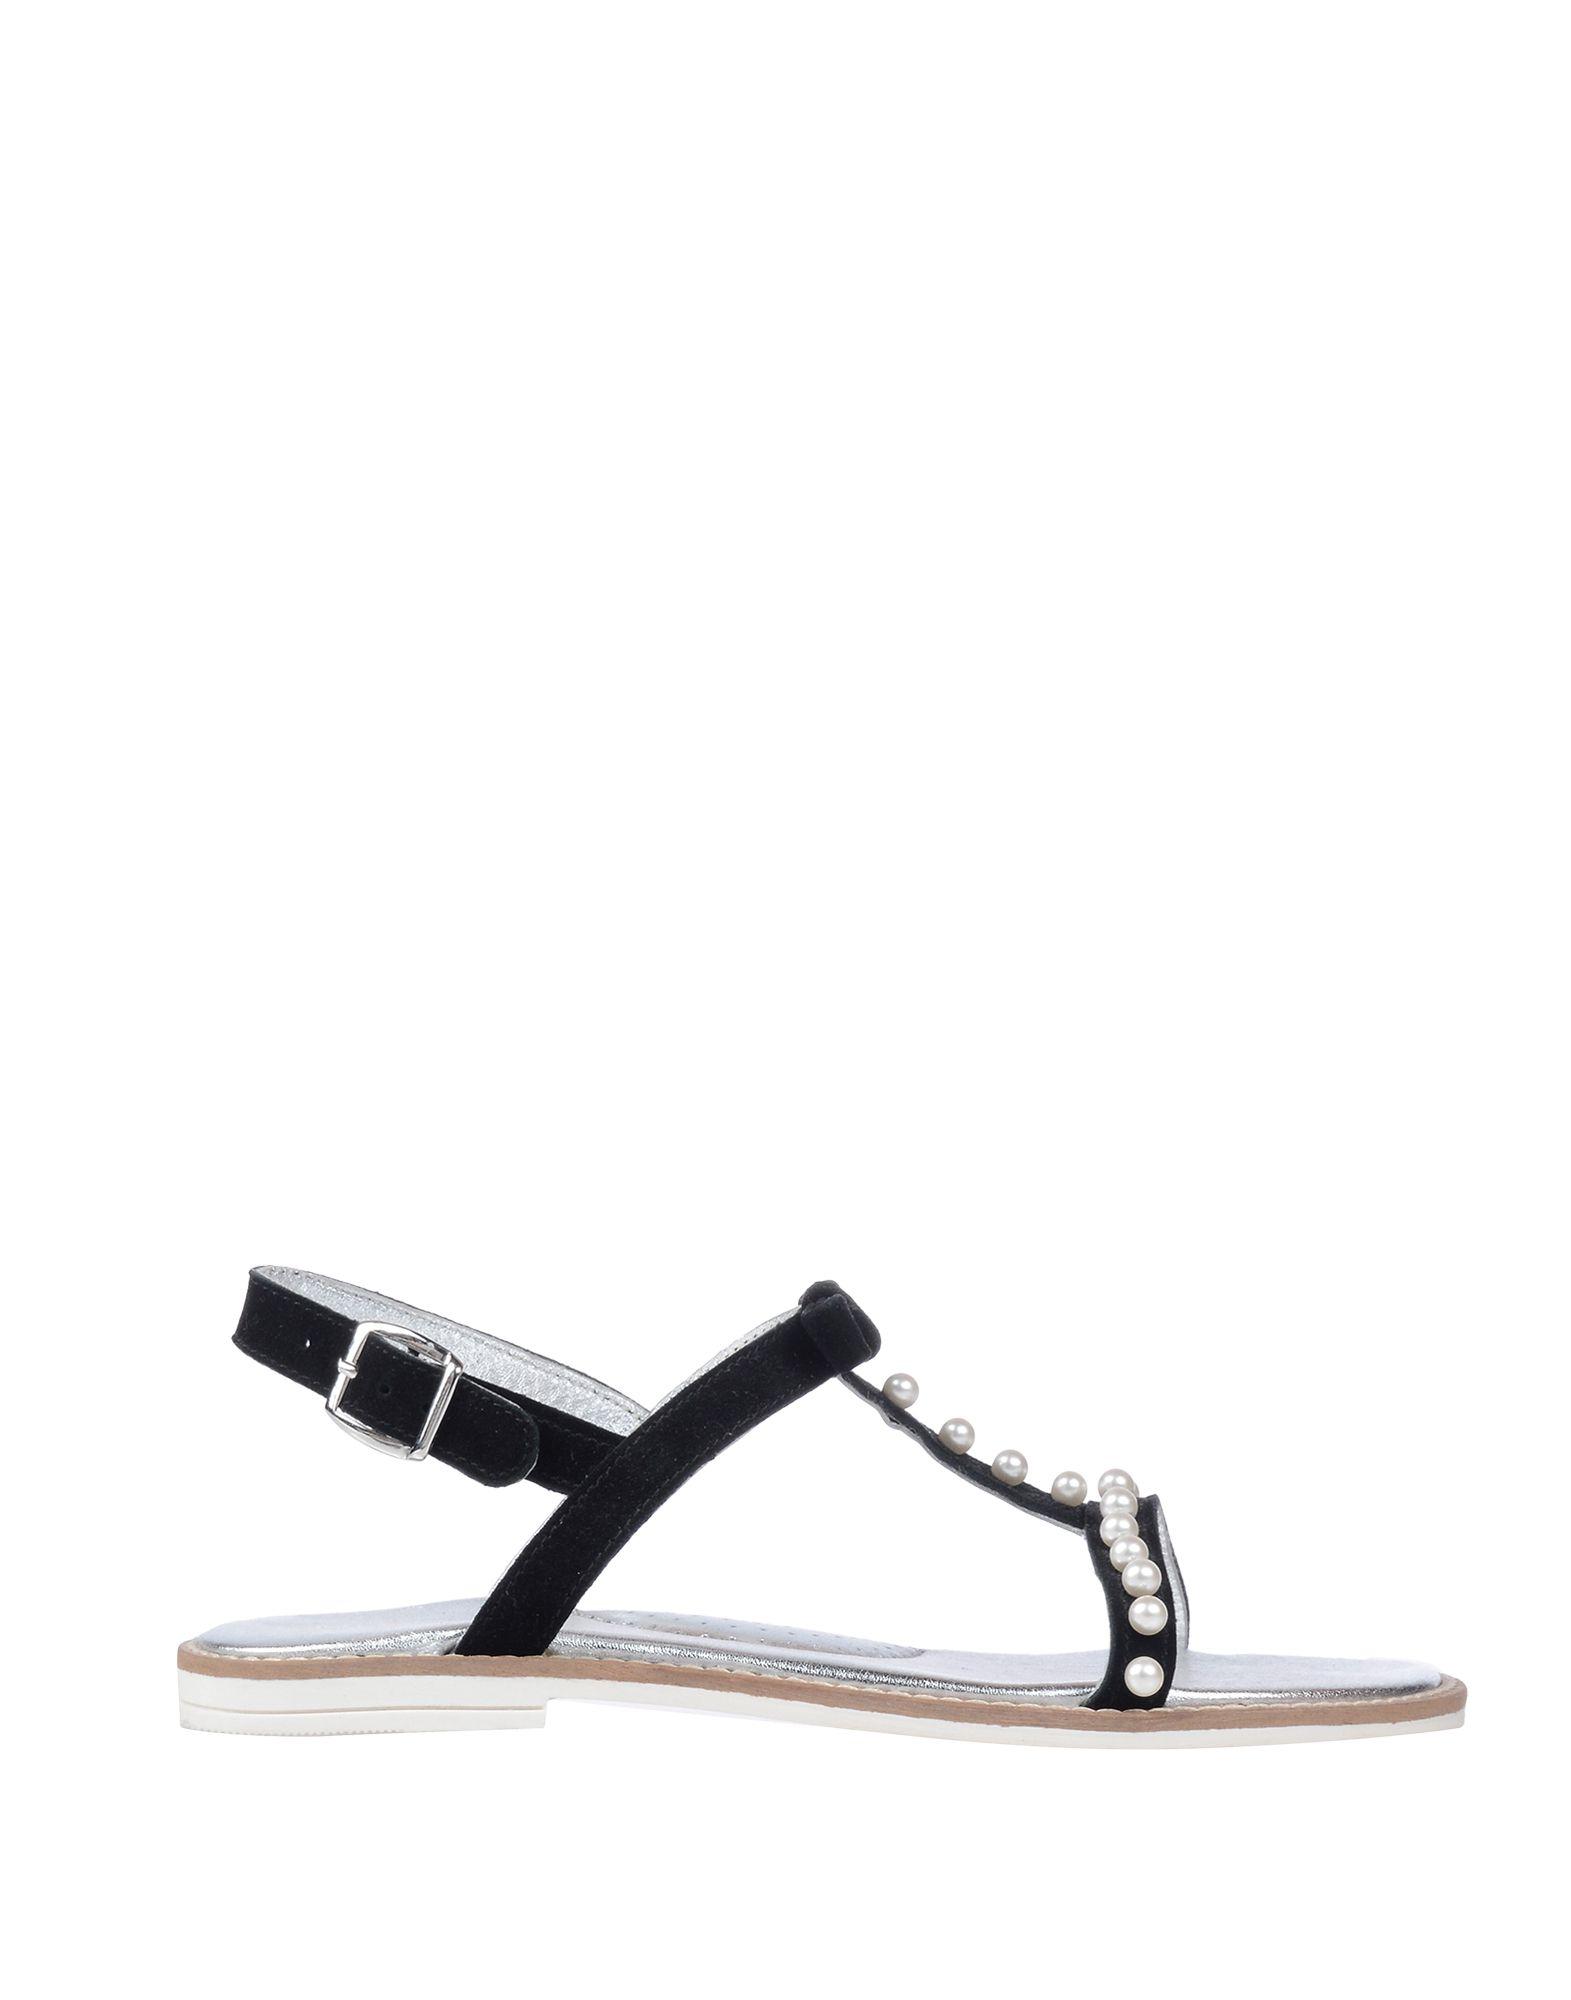 Monnalisa Sandals Sandals - Women Monnalisa Sandals Monnalisa online on  Australia - 11501650IW 7d974b